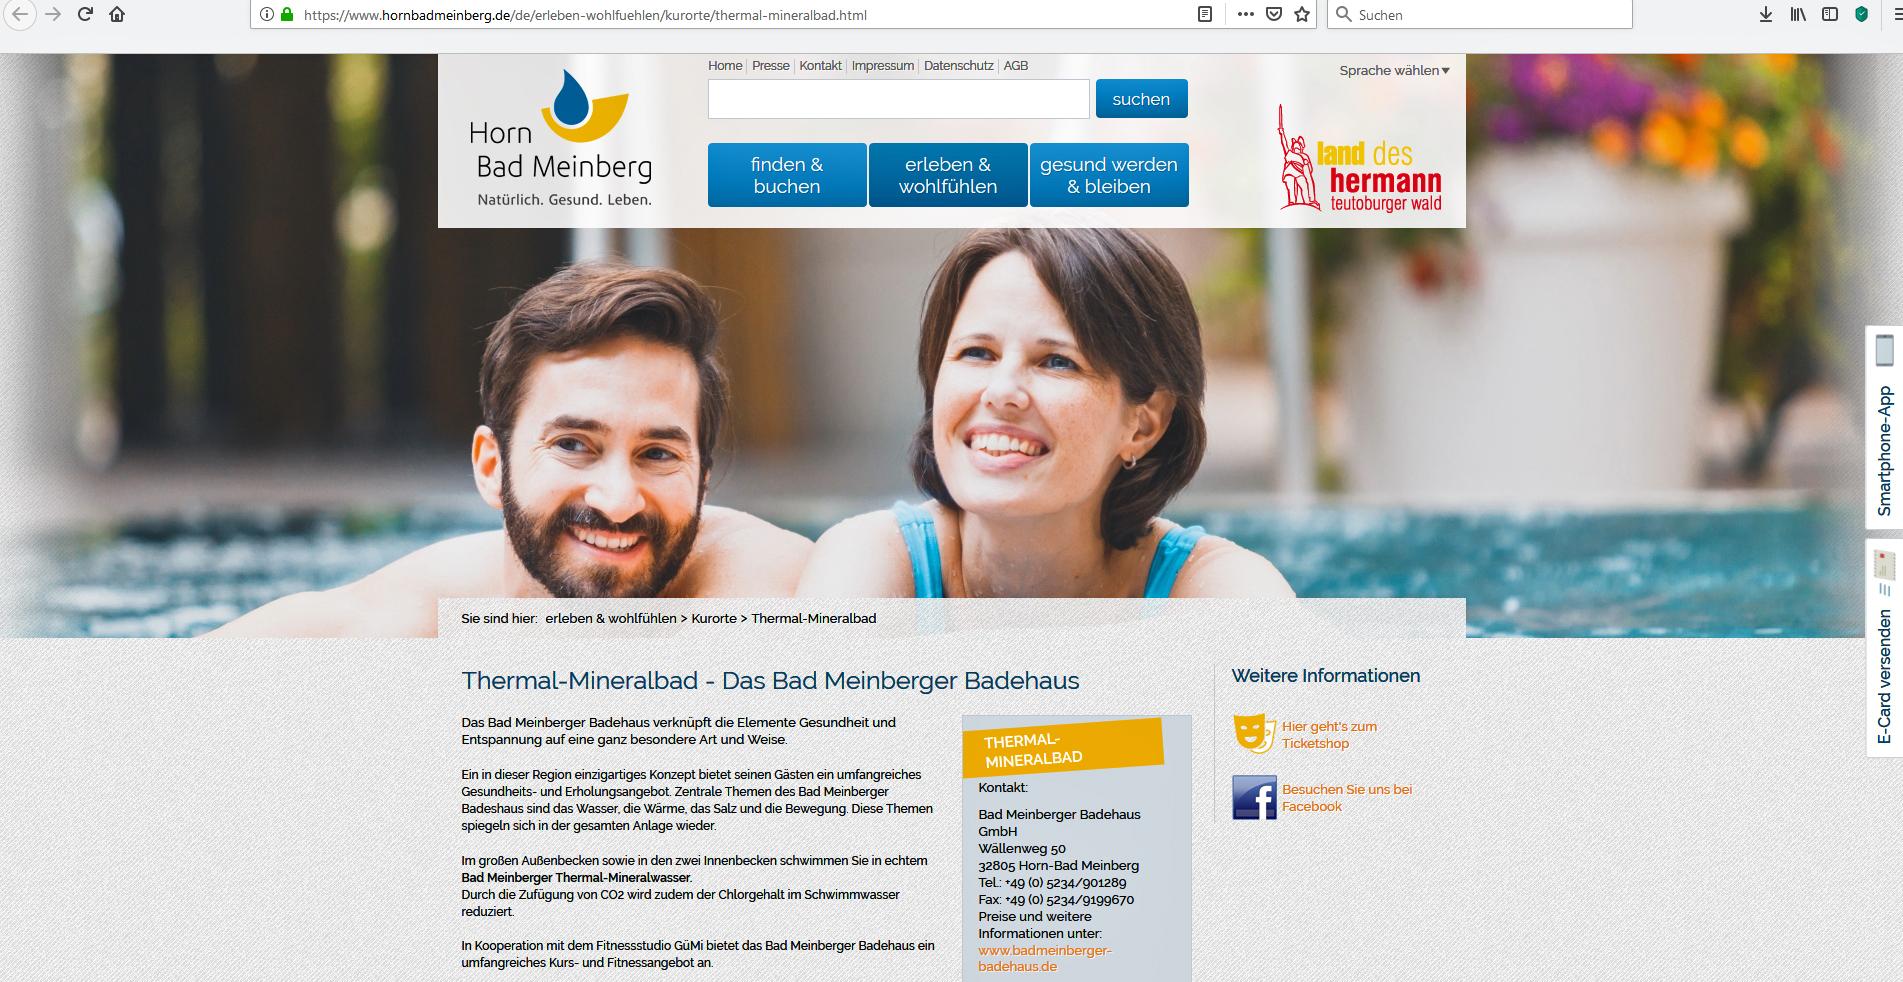 www.hornbadmeinberg.de